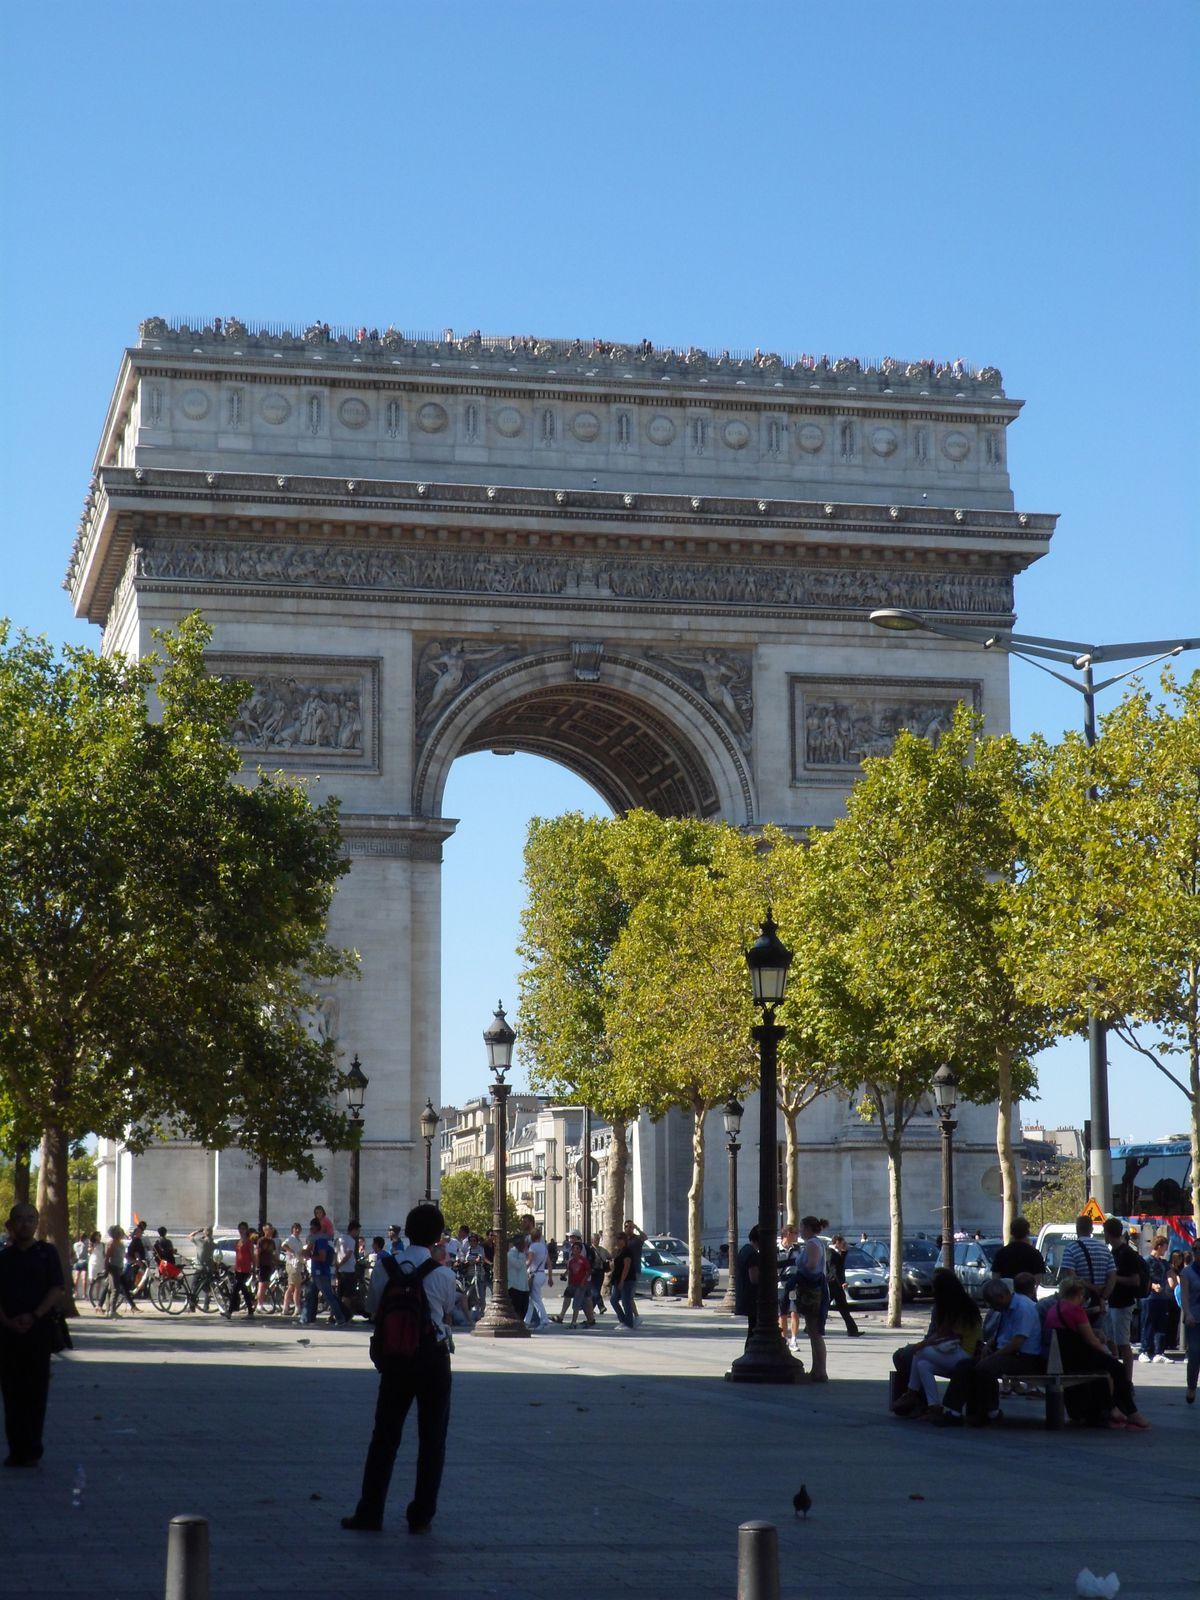 Paris, Paris, sera toujours Paris